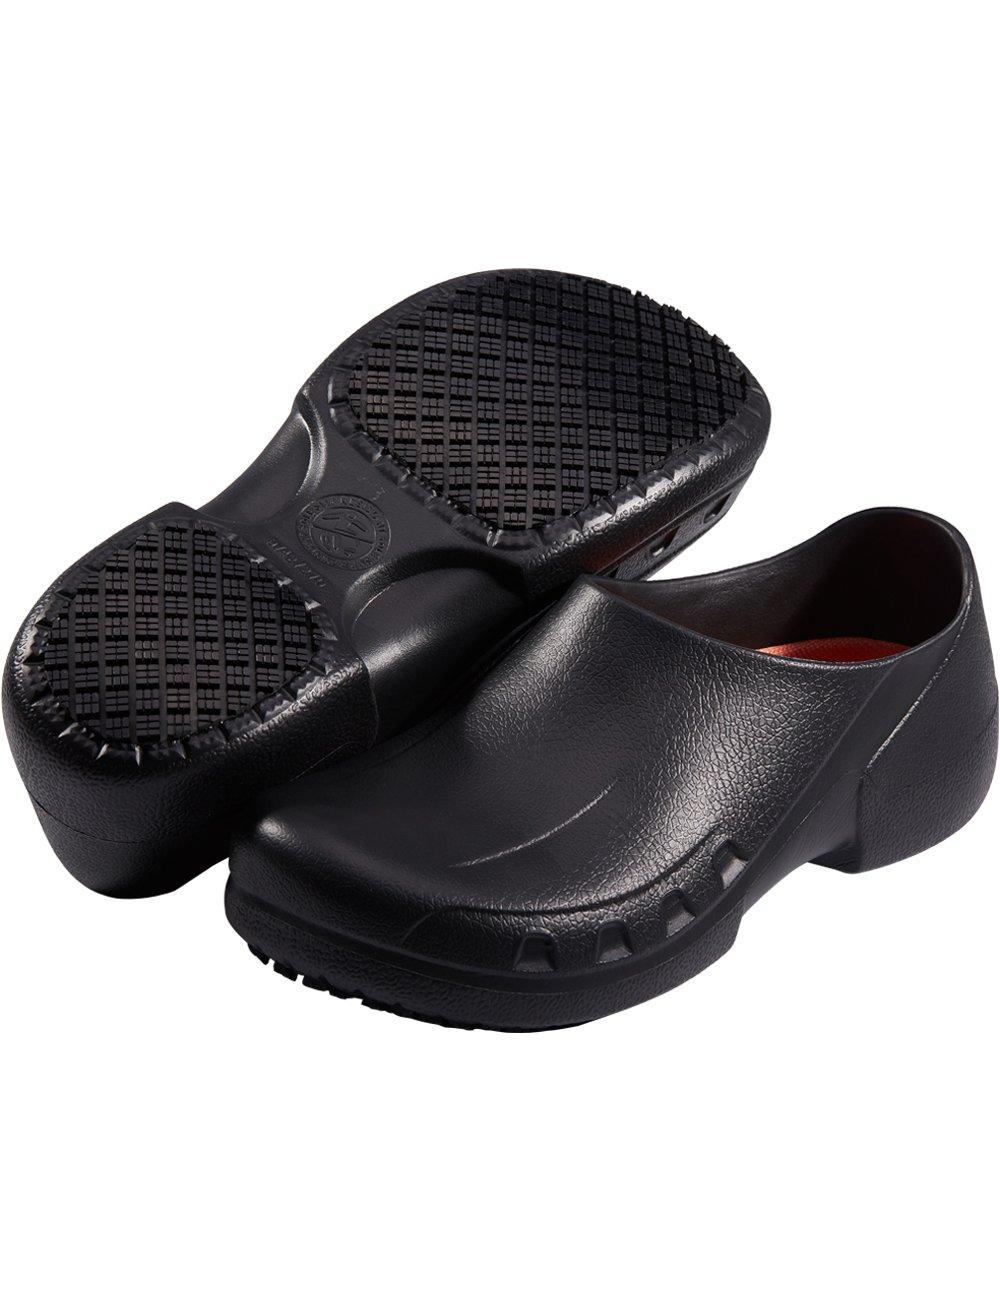 SensFoot Slip Resistant Chef Shoes Restaurant Non Slip Work Shoes for Men Women (12 M US Women / 10 M US Men) Black by SensFoot